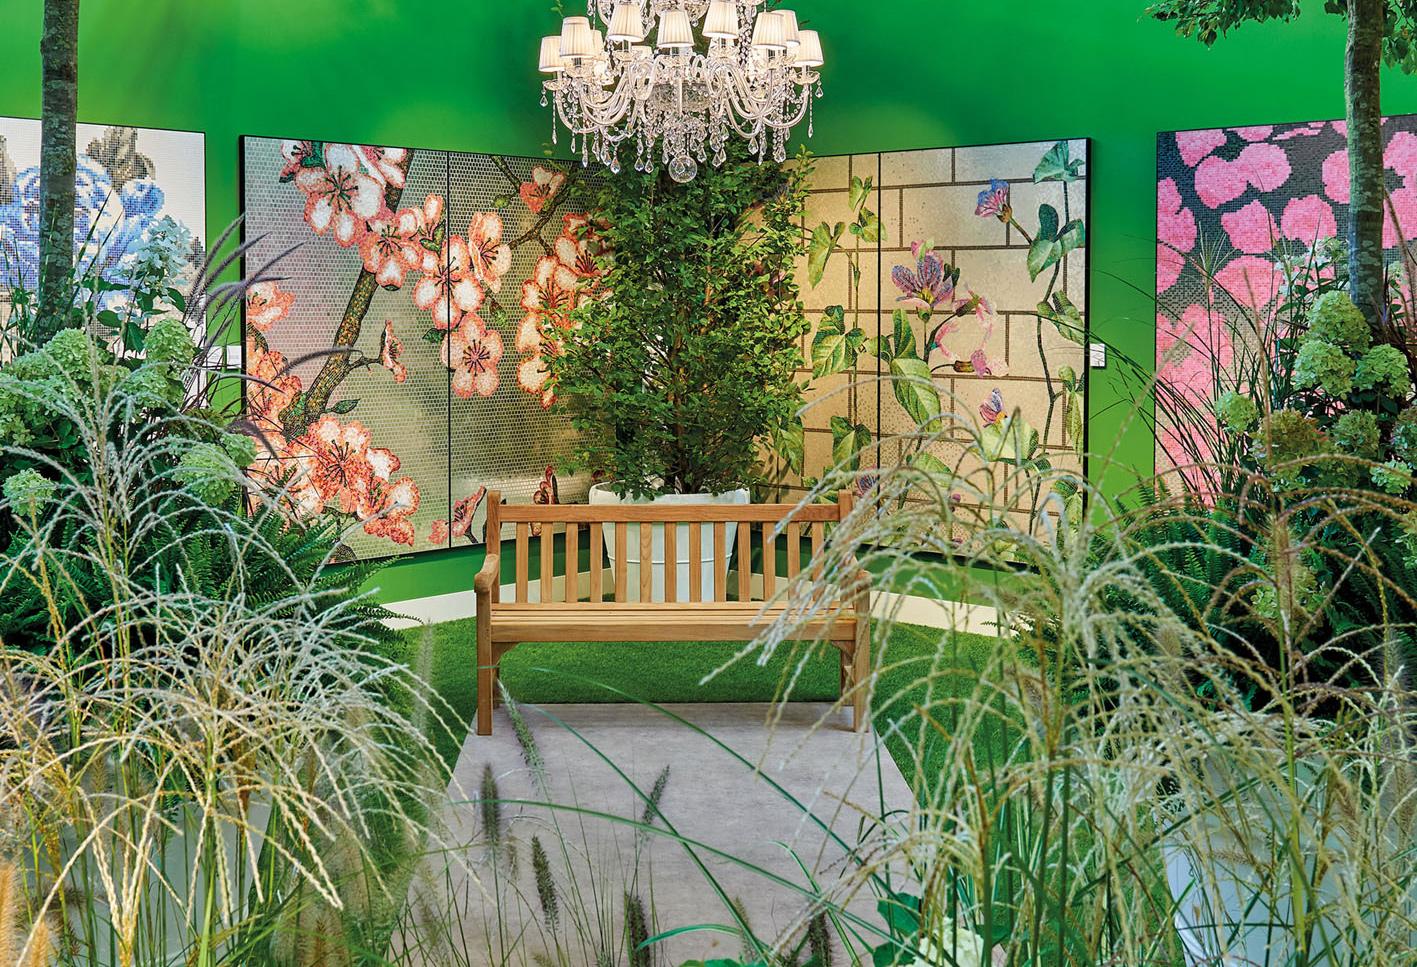 Il Giardino Segreto - Bisazza's 2018 Cersaie Stand